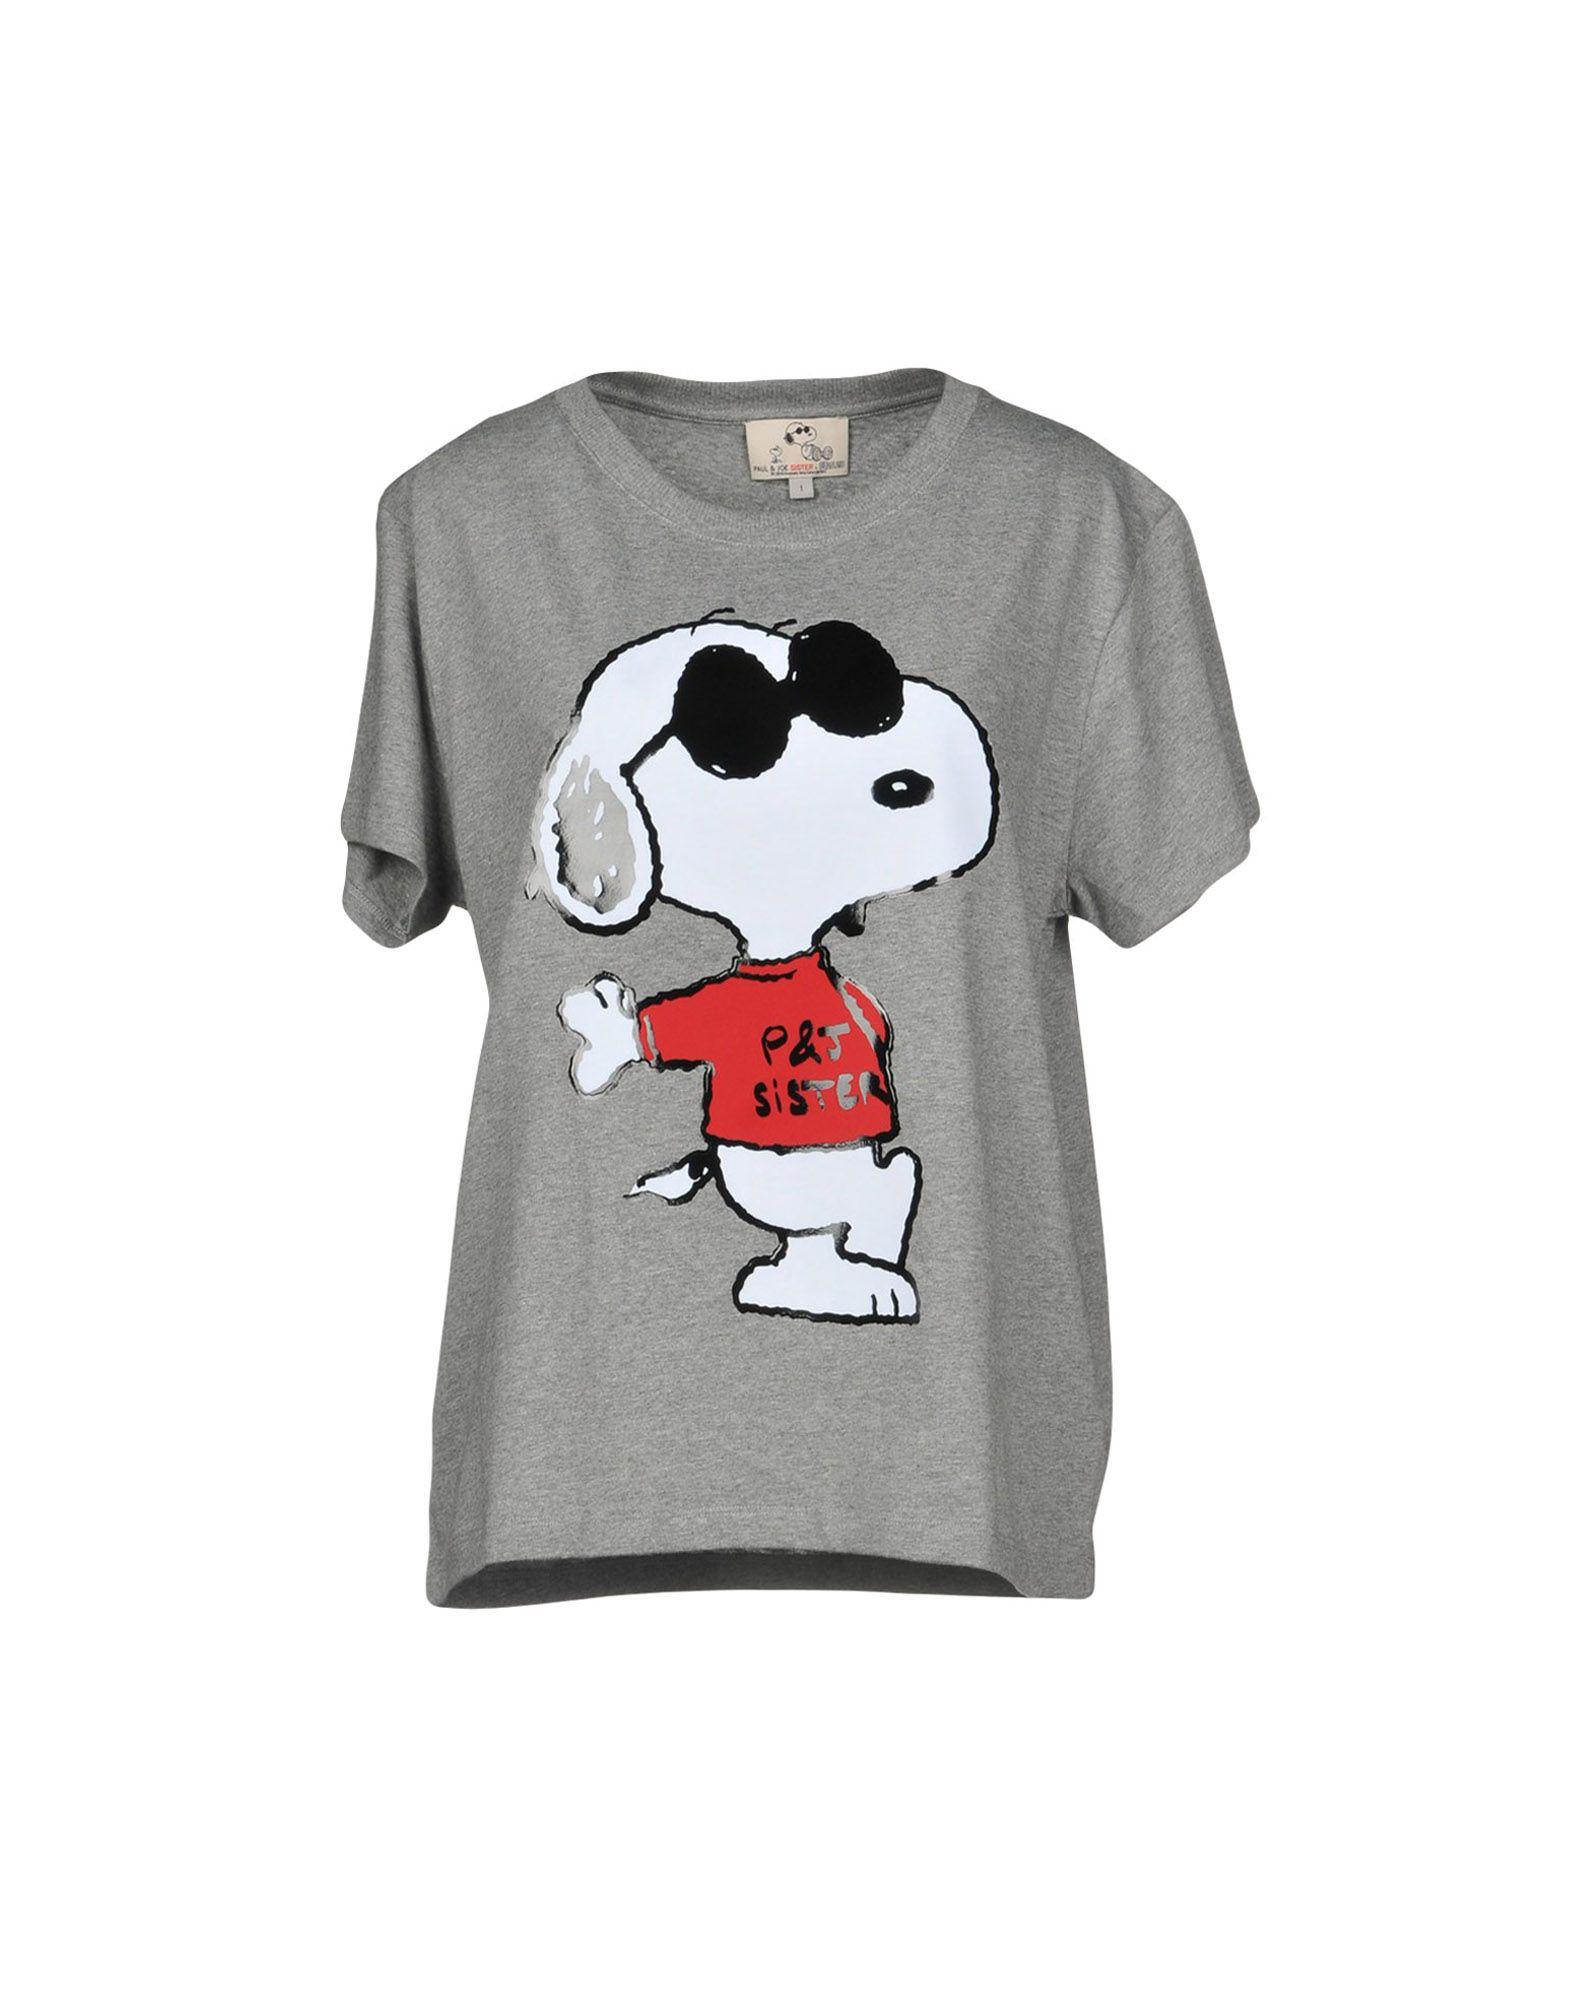 T-Shirt Paul & Joe Sister Sister Sister donna - 12207718FE c3e